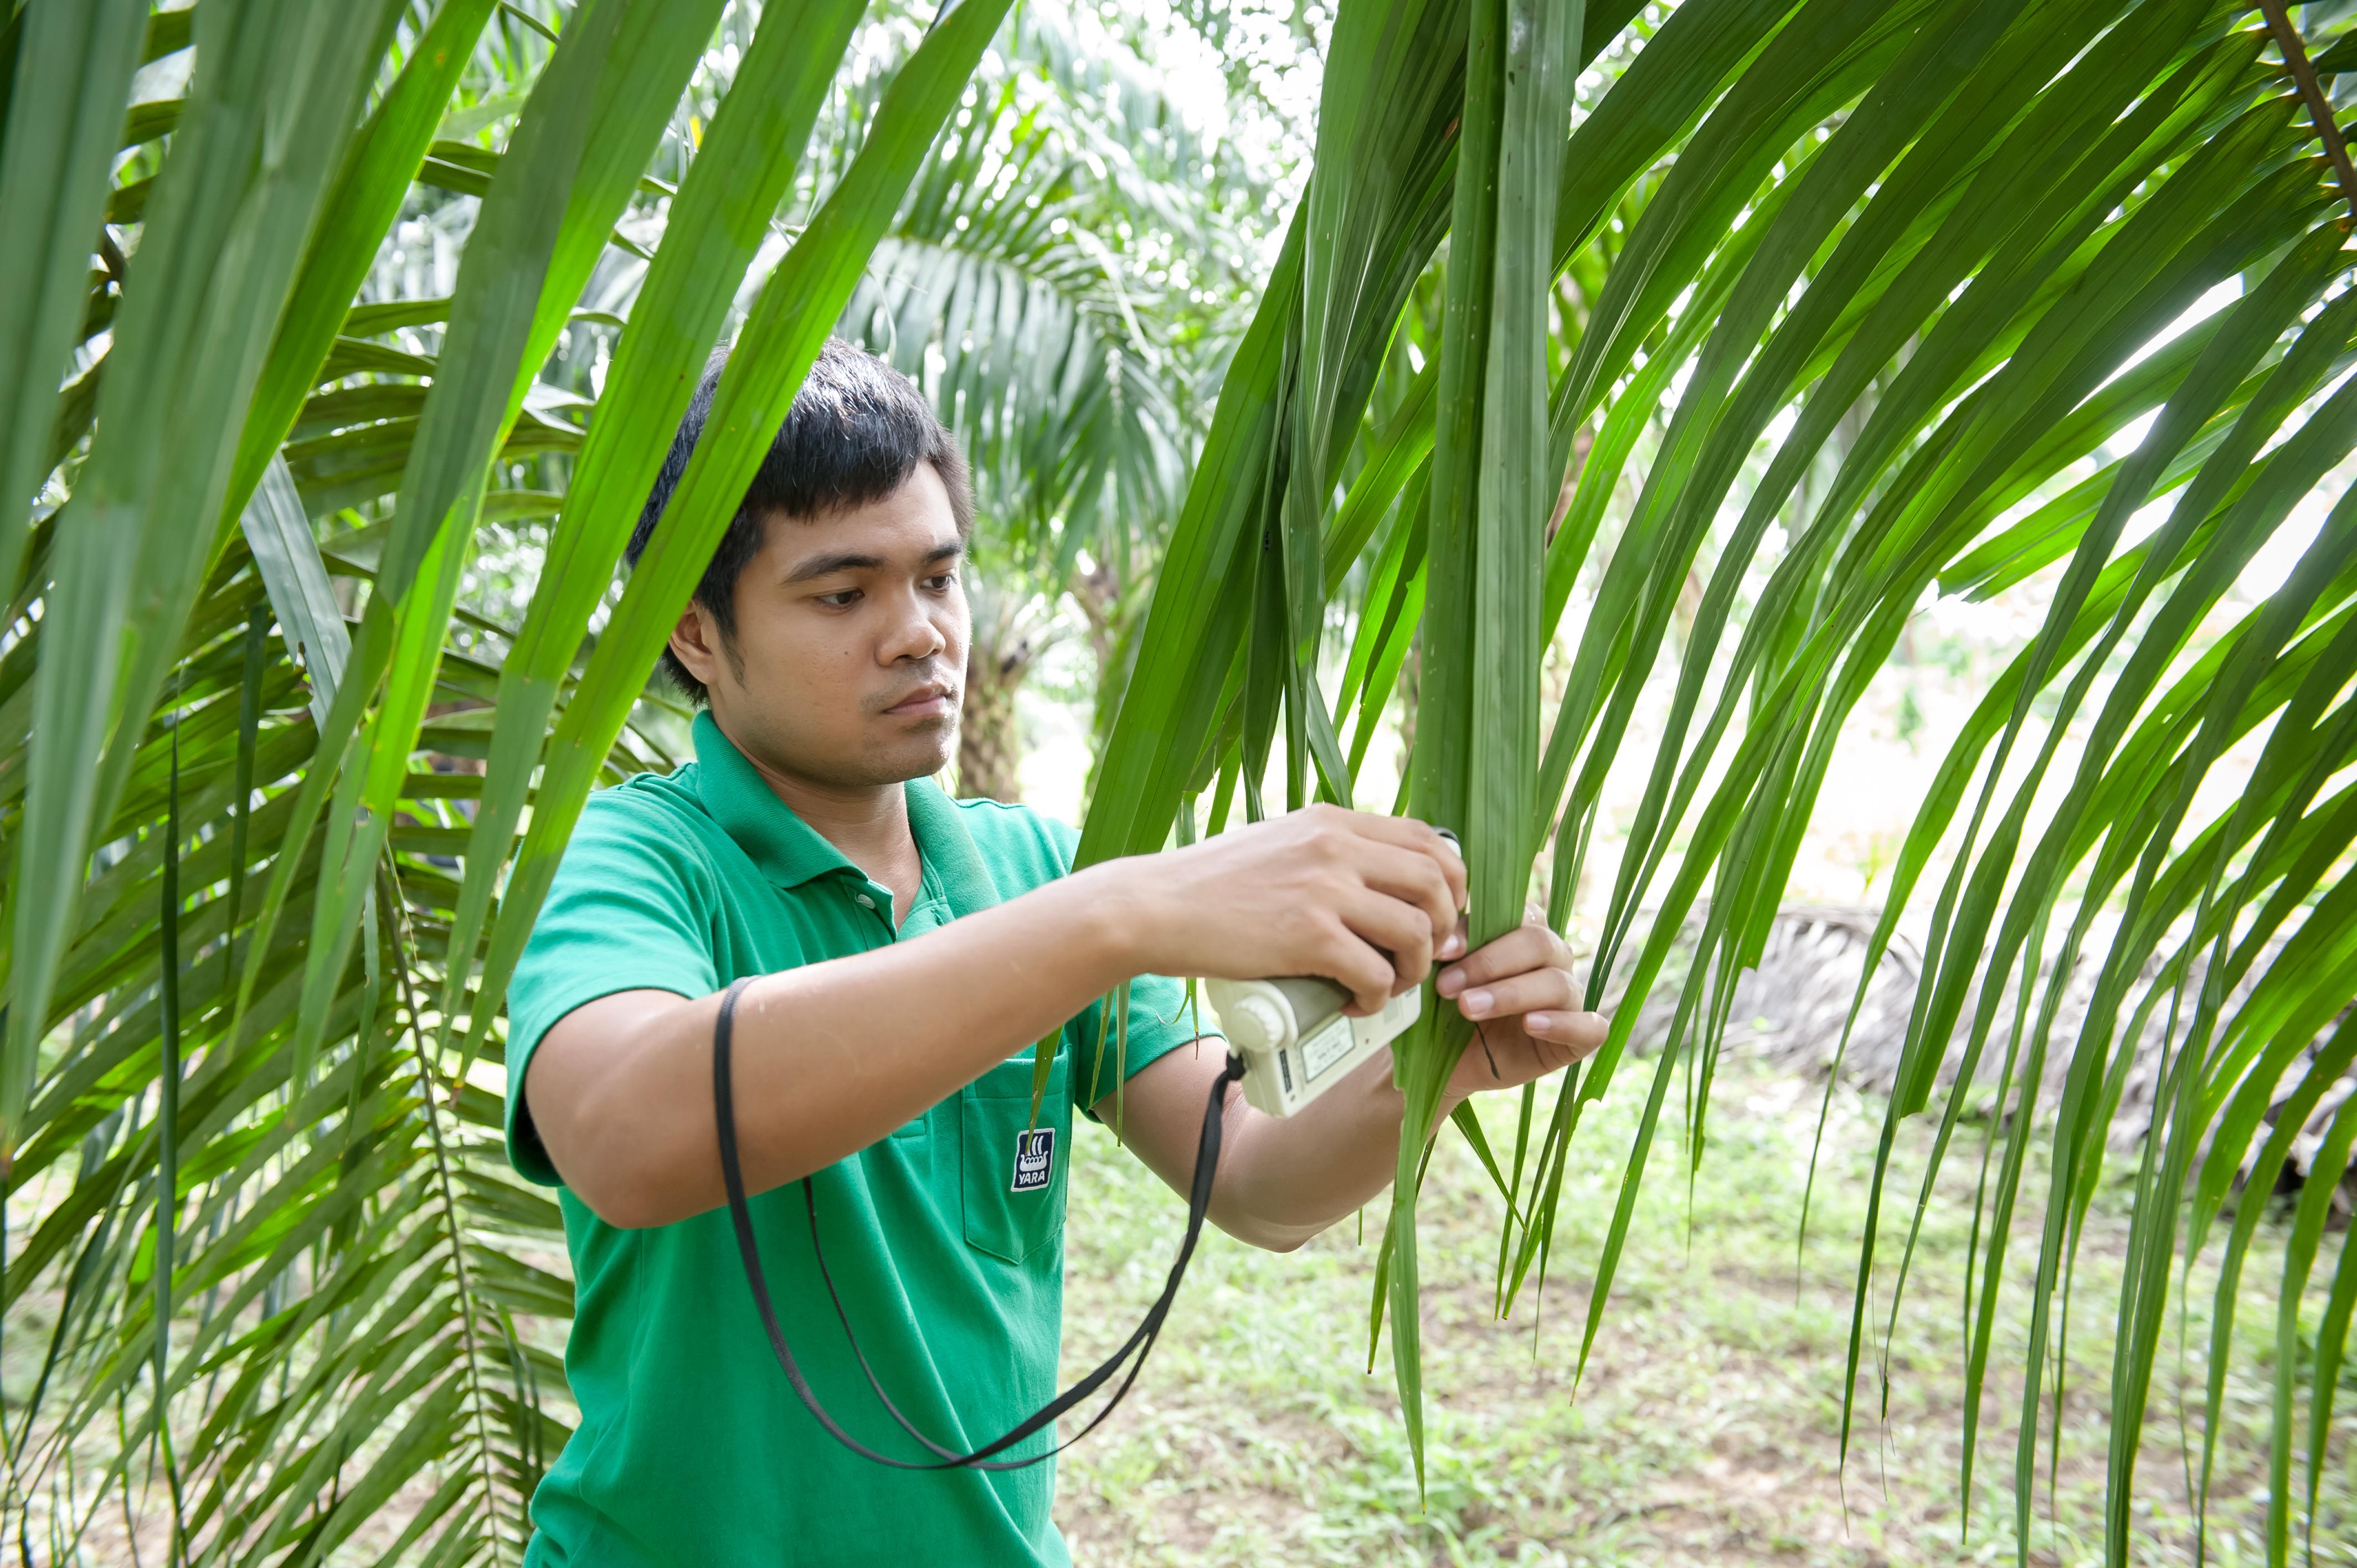 Leaf analysis - to identify nutrient deficiencies